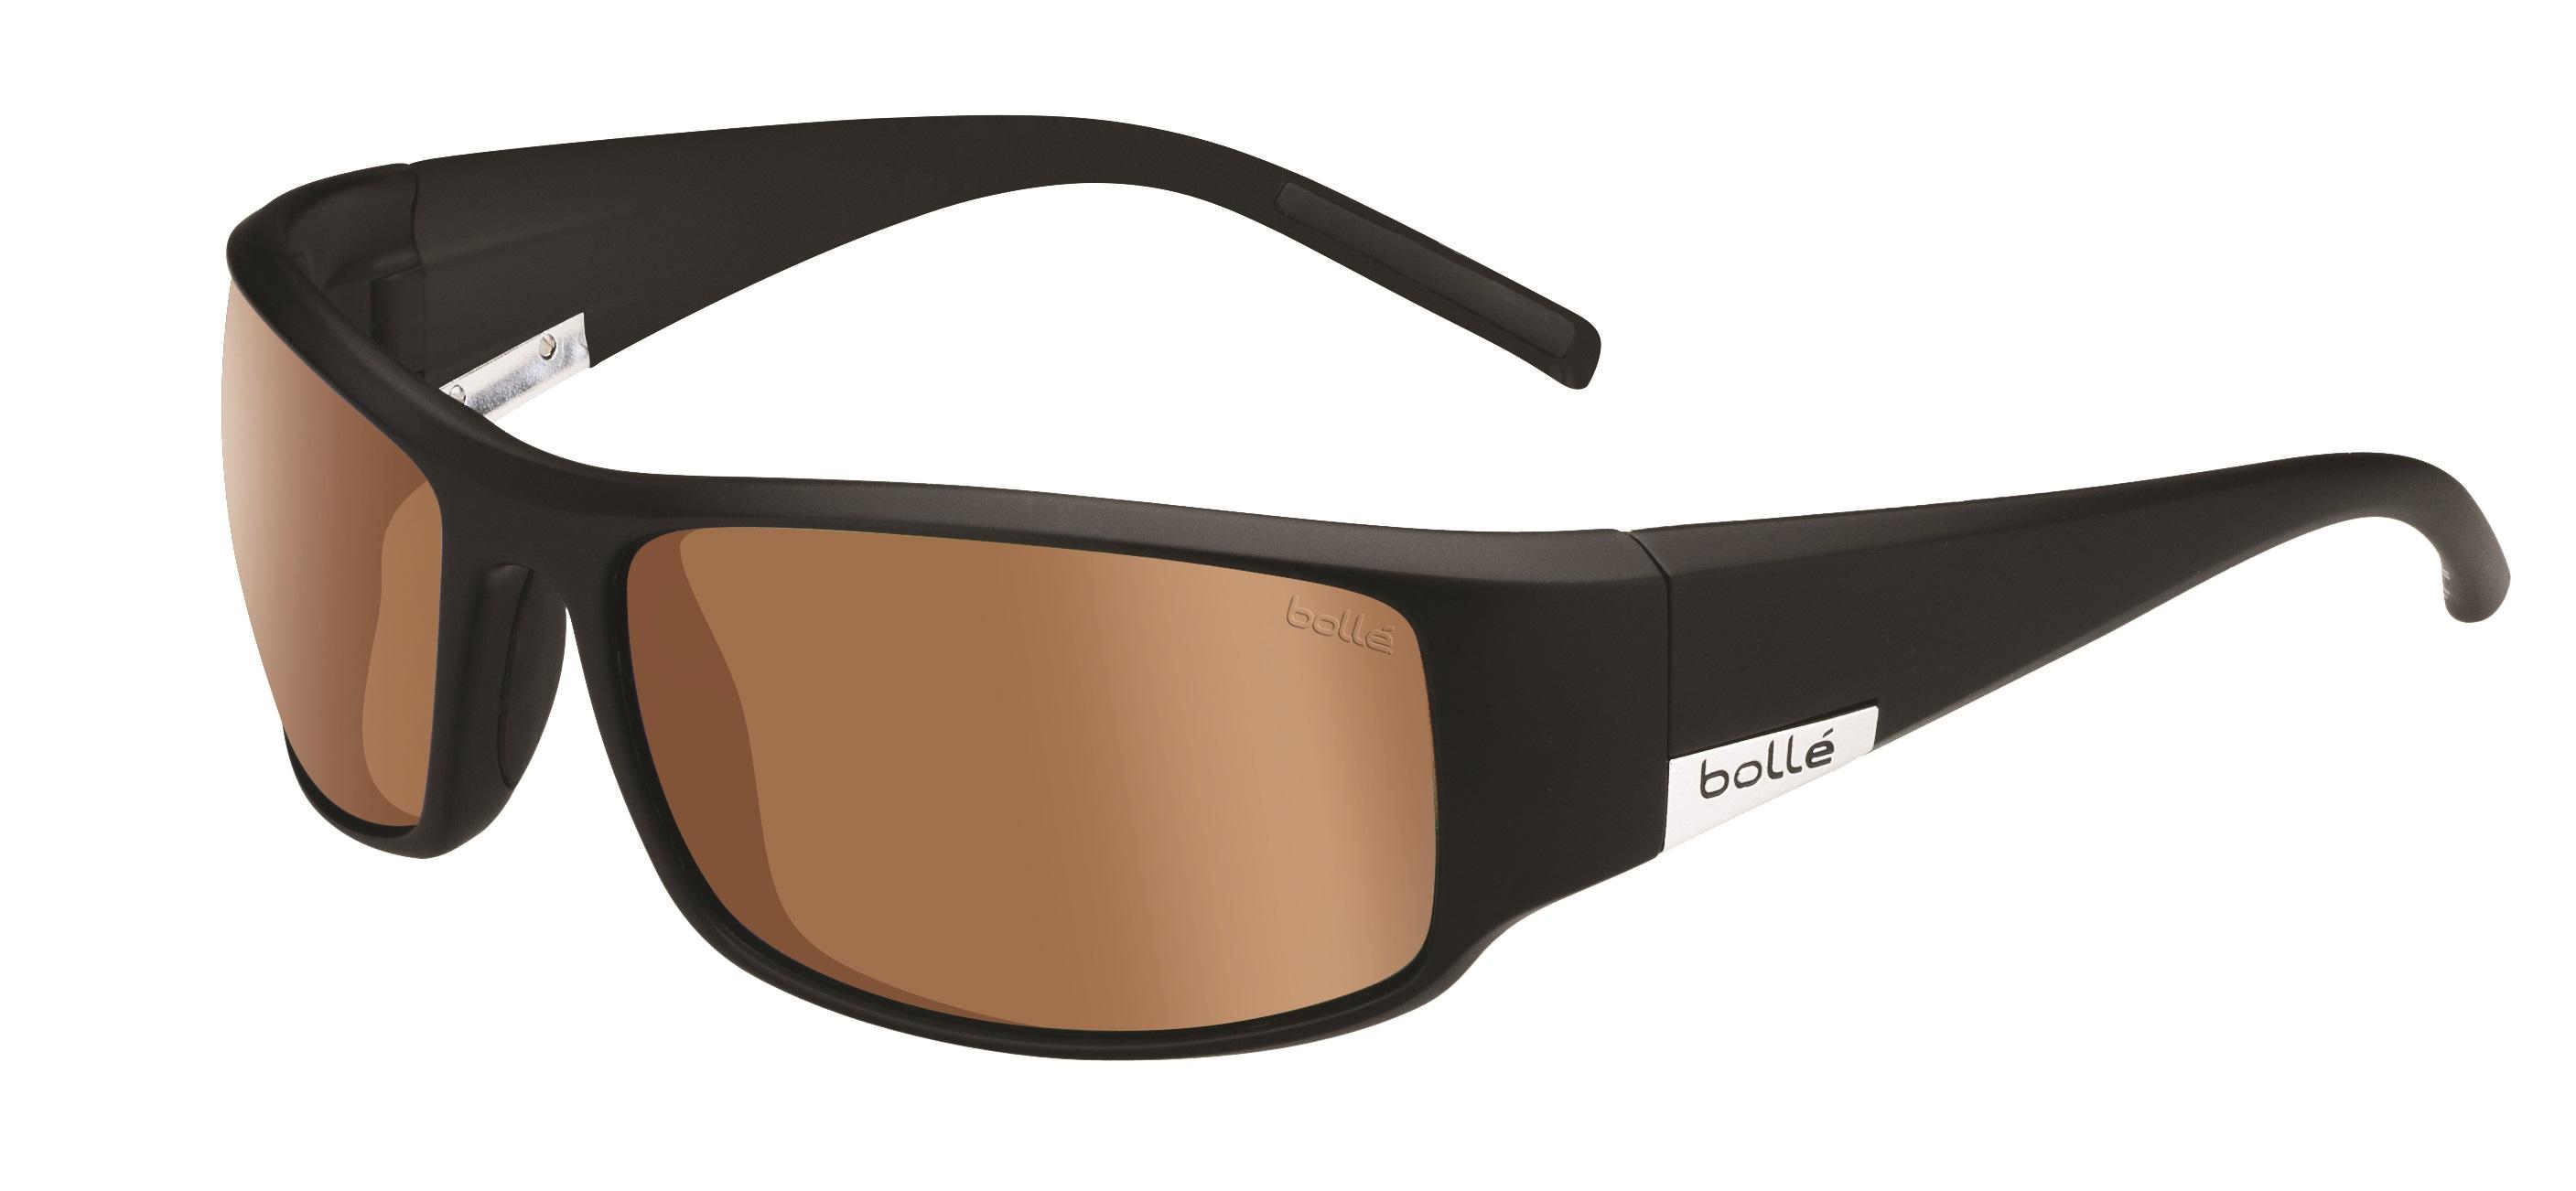 487b5b437d Bolle Mens King Sunglasses